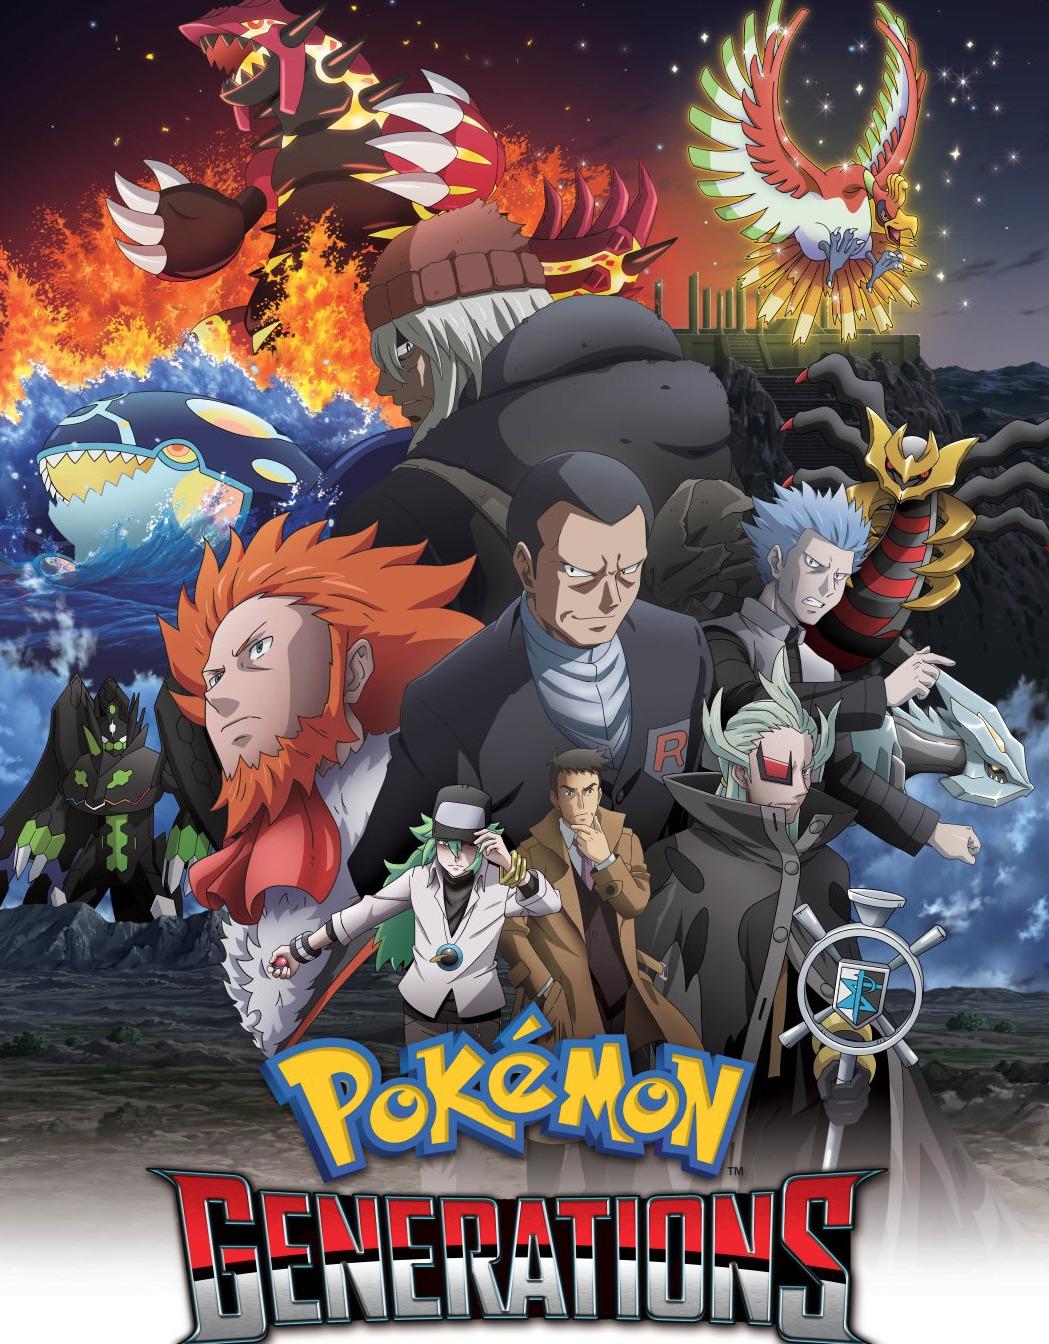 pokemon-generations-trailer-2